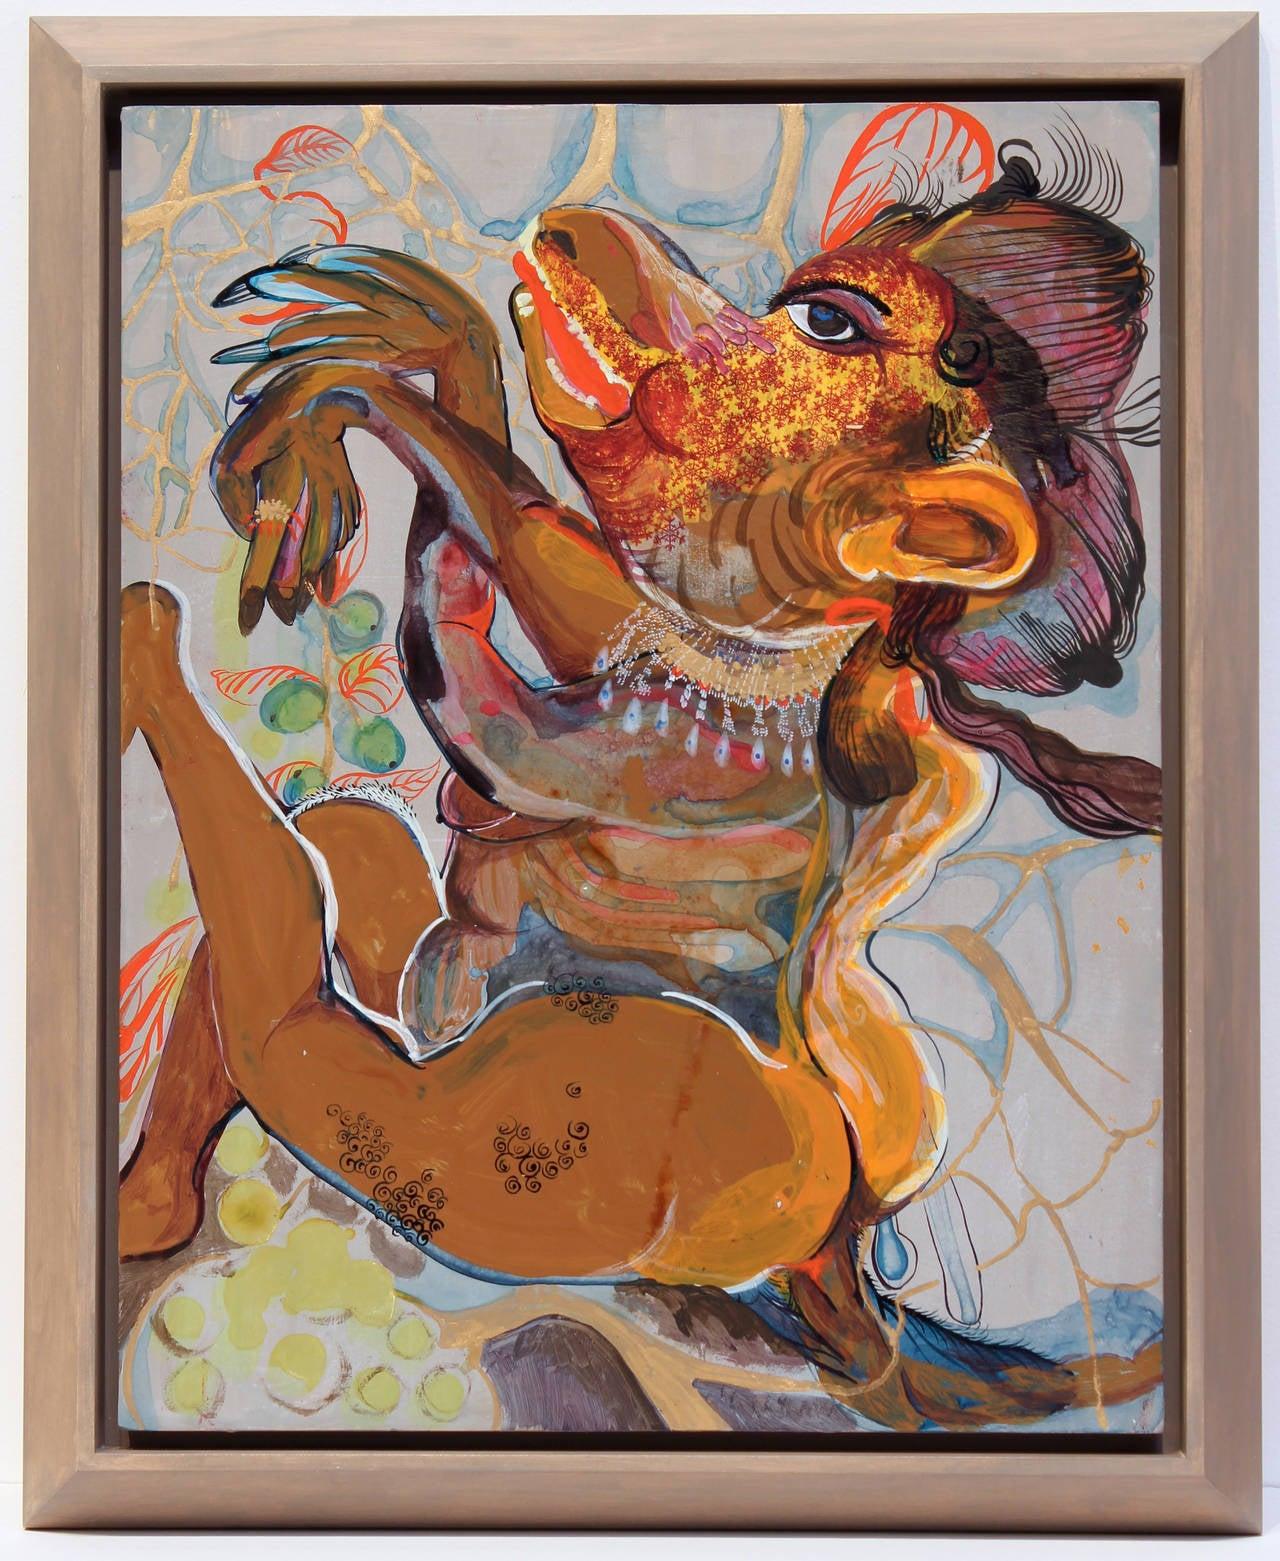 Rina Banerjee Figurative Painting - Beast of Dispossession